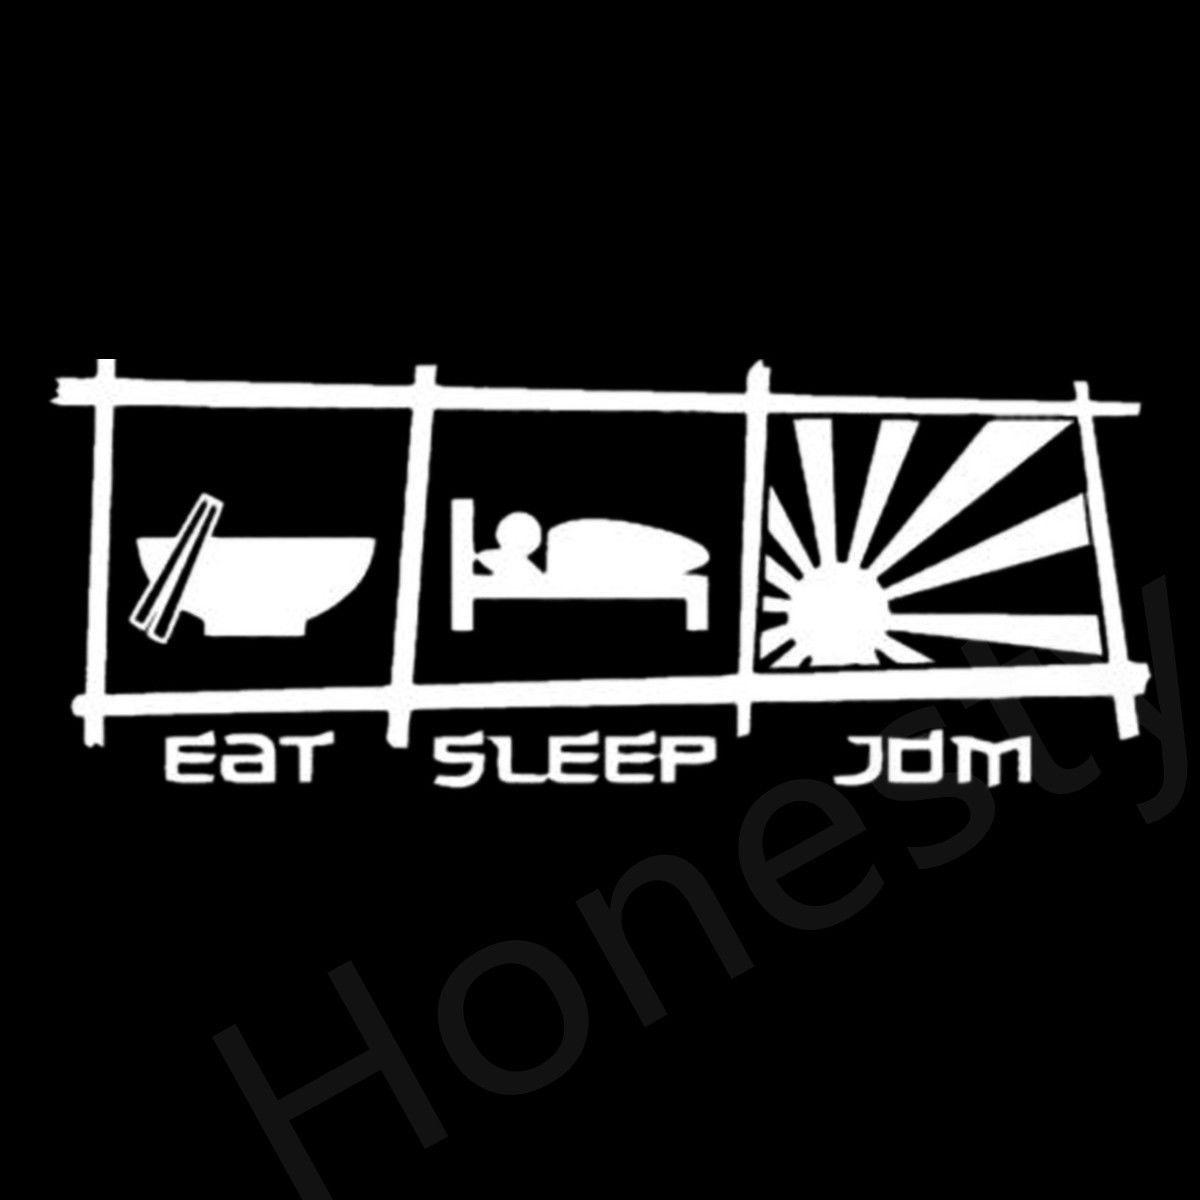 EAT SLEEP JDM V2 Vinyl Decal JDM Sticker Window Car